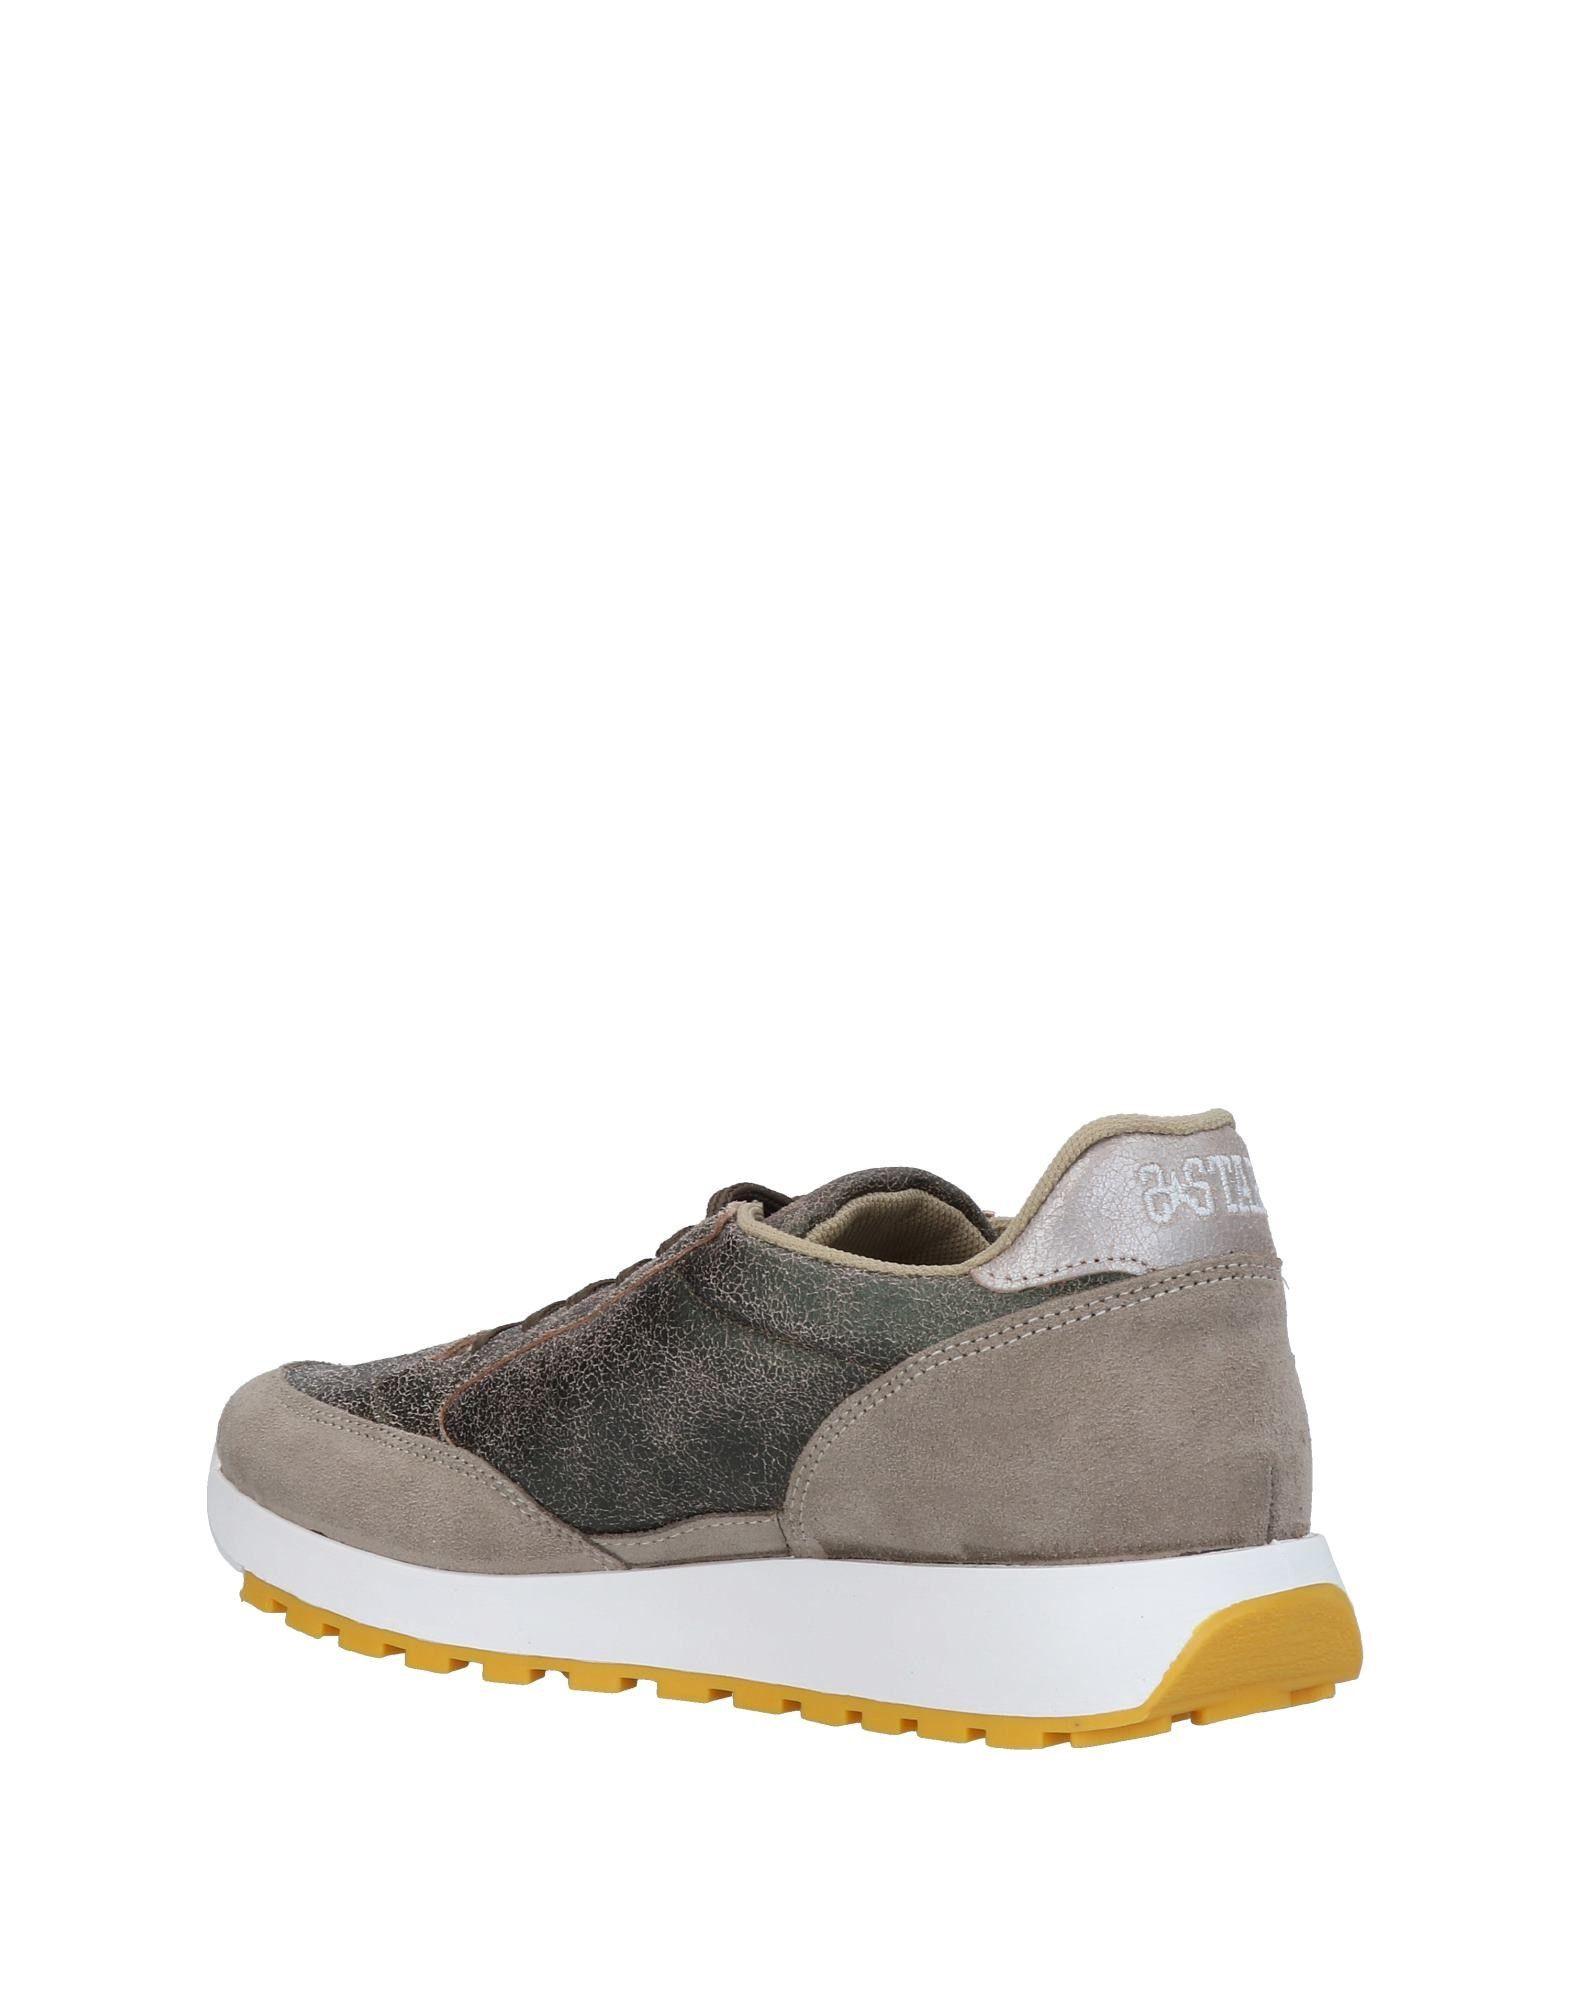 2Star Sneakers - Men Men Men 2Star Sneakers online on  Australia - 11453448LE cdb589